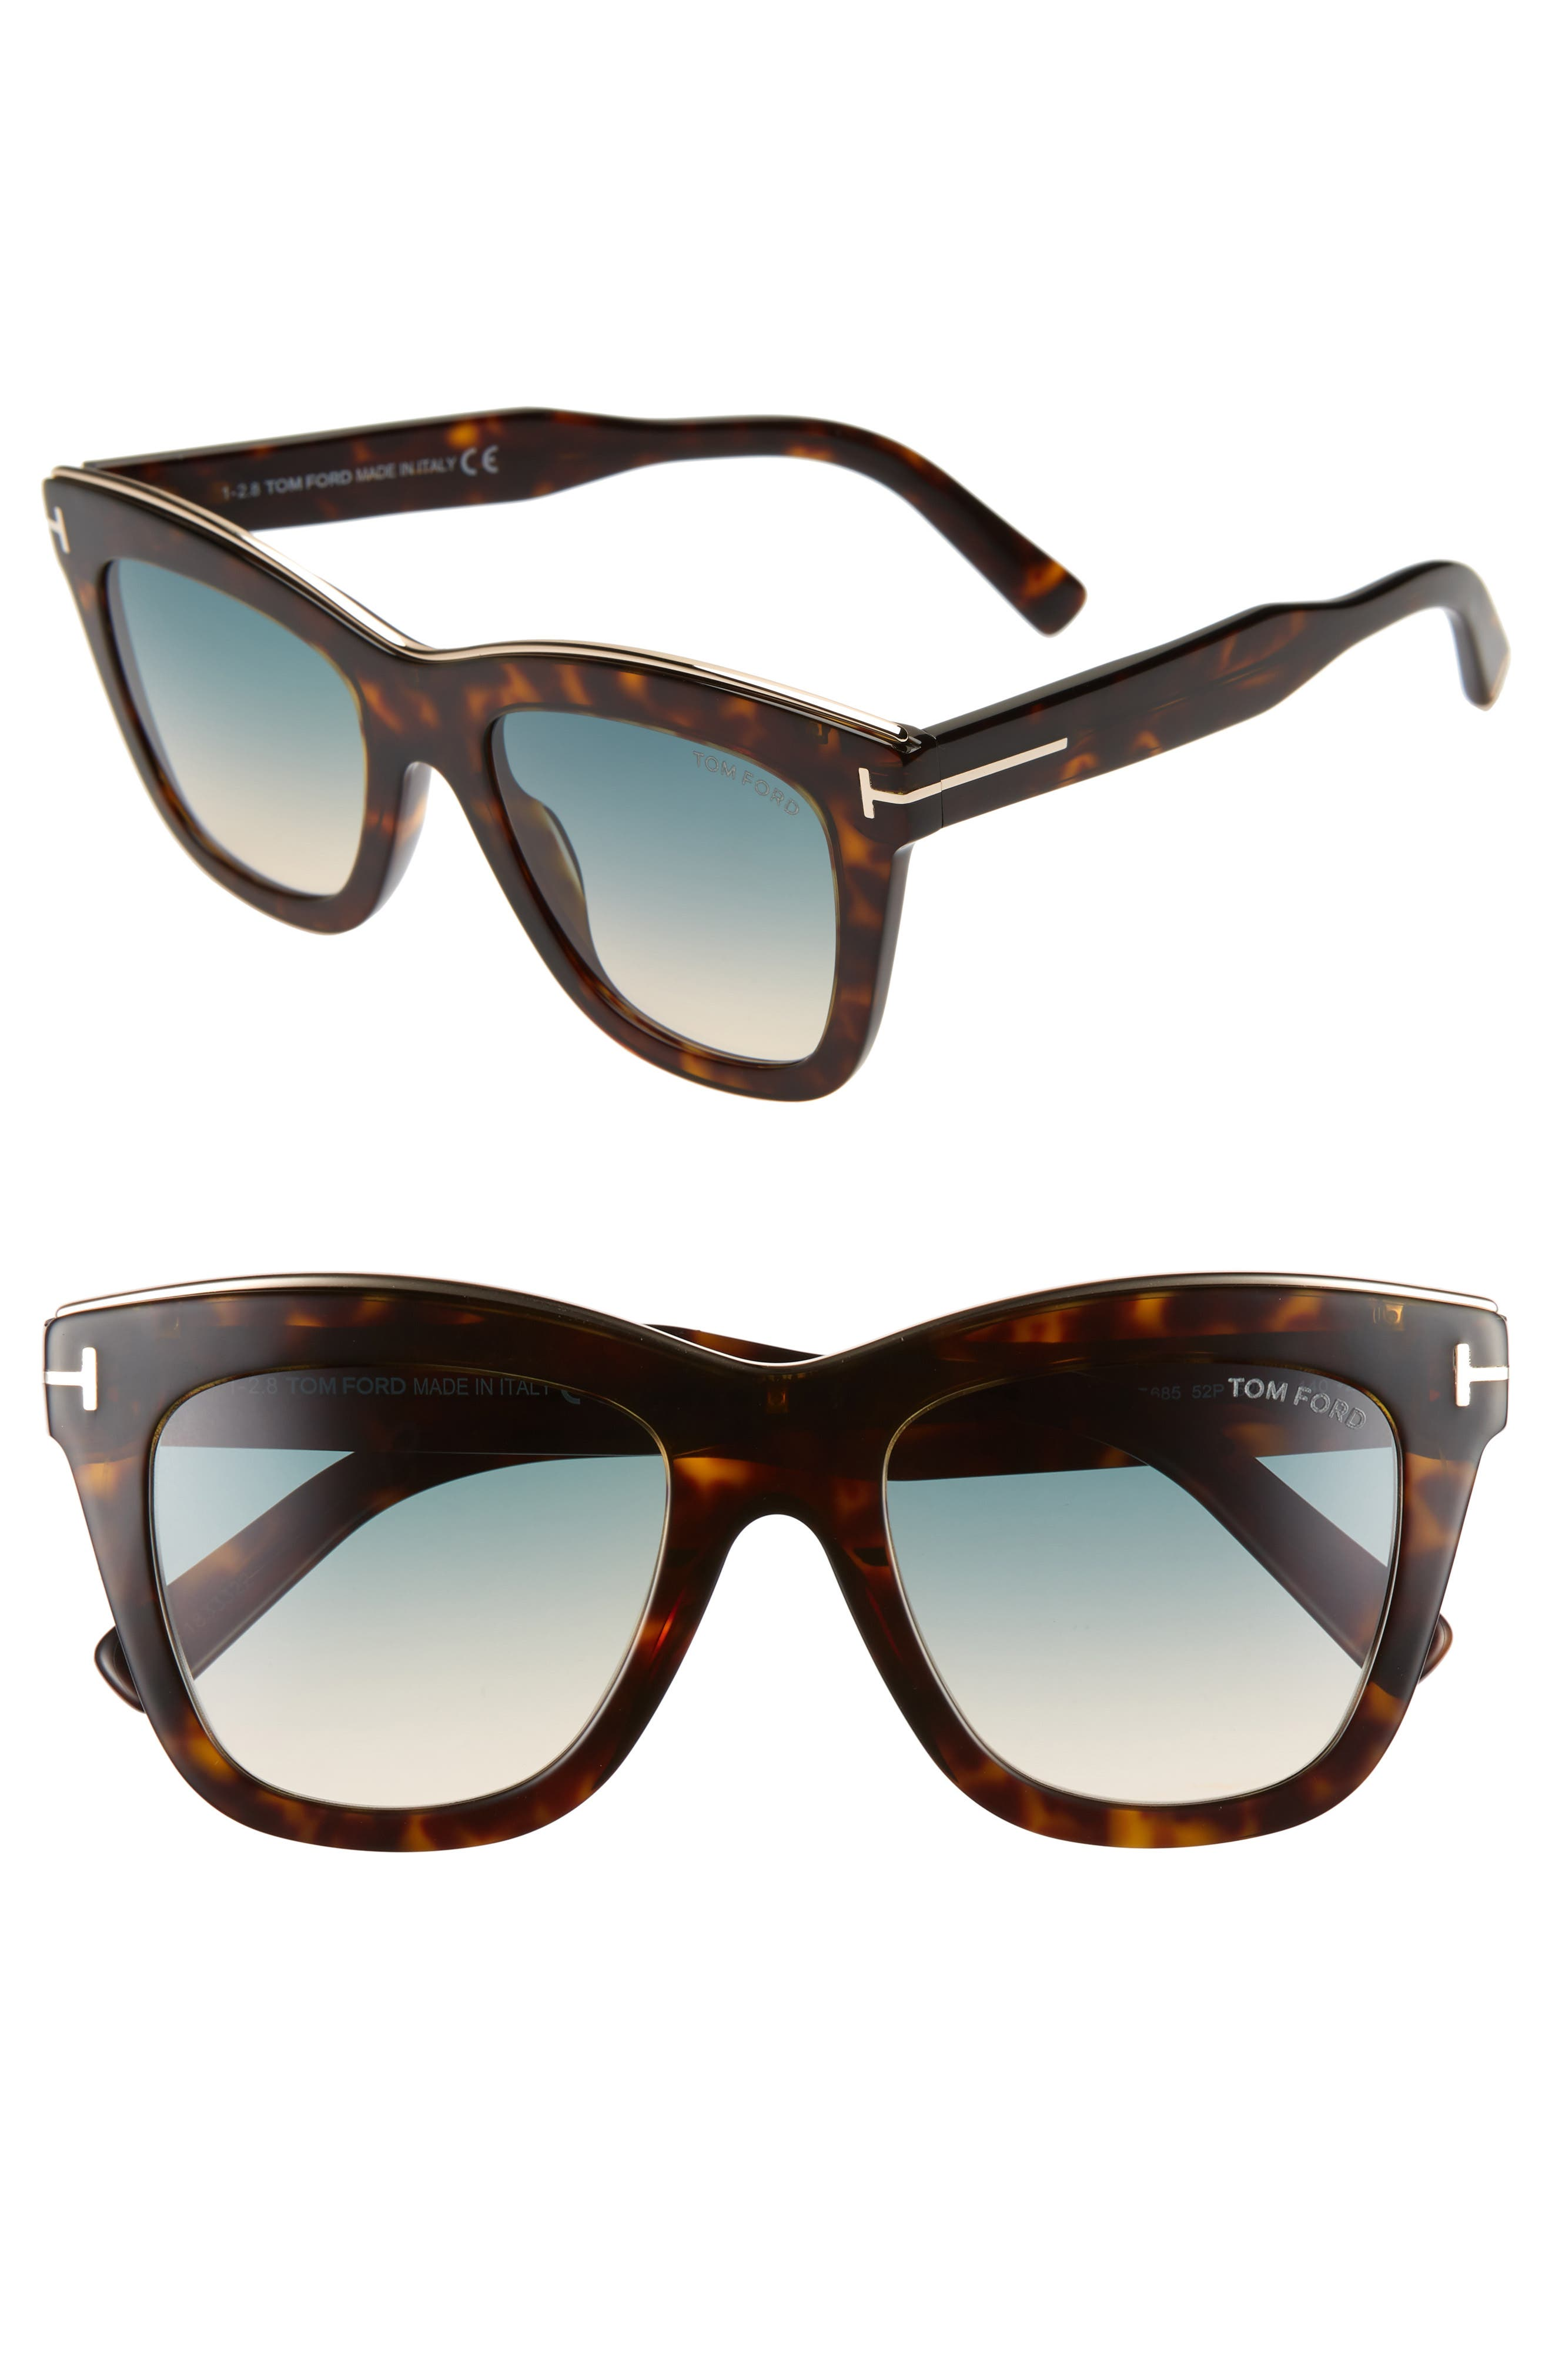 Tom Ford Julie 52Mm Sunglasses - Dark Havana/ Turq To Sand